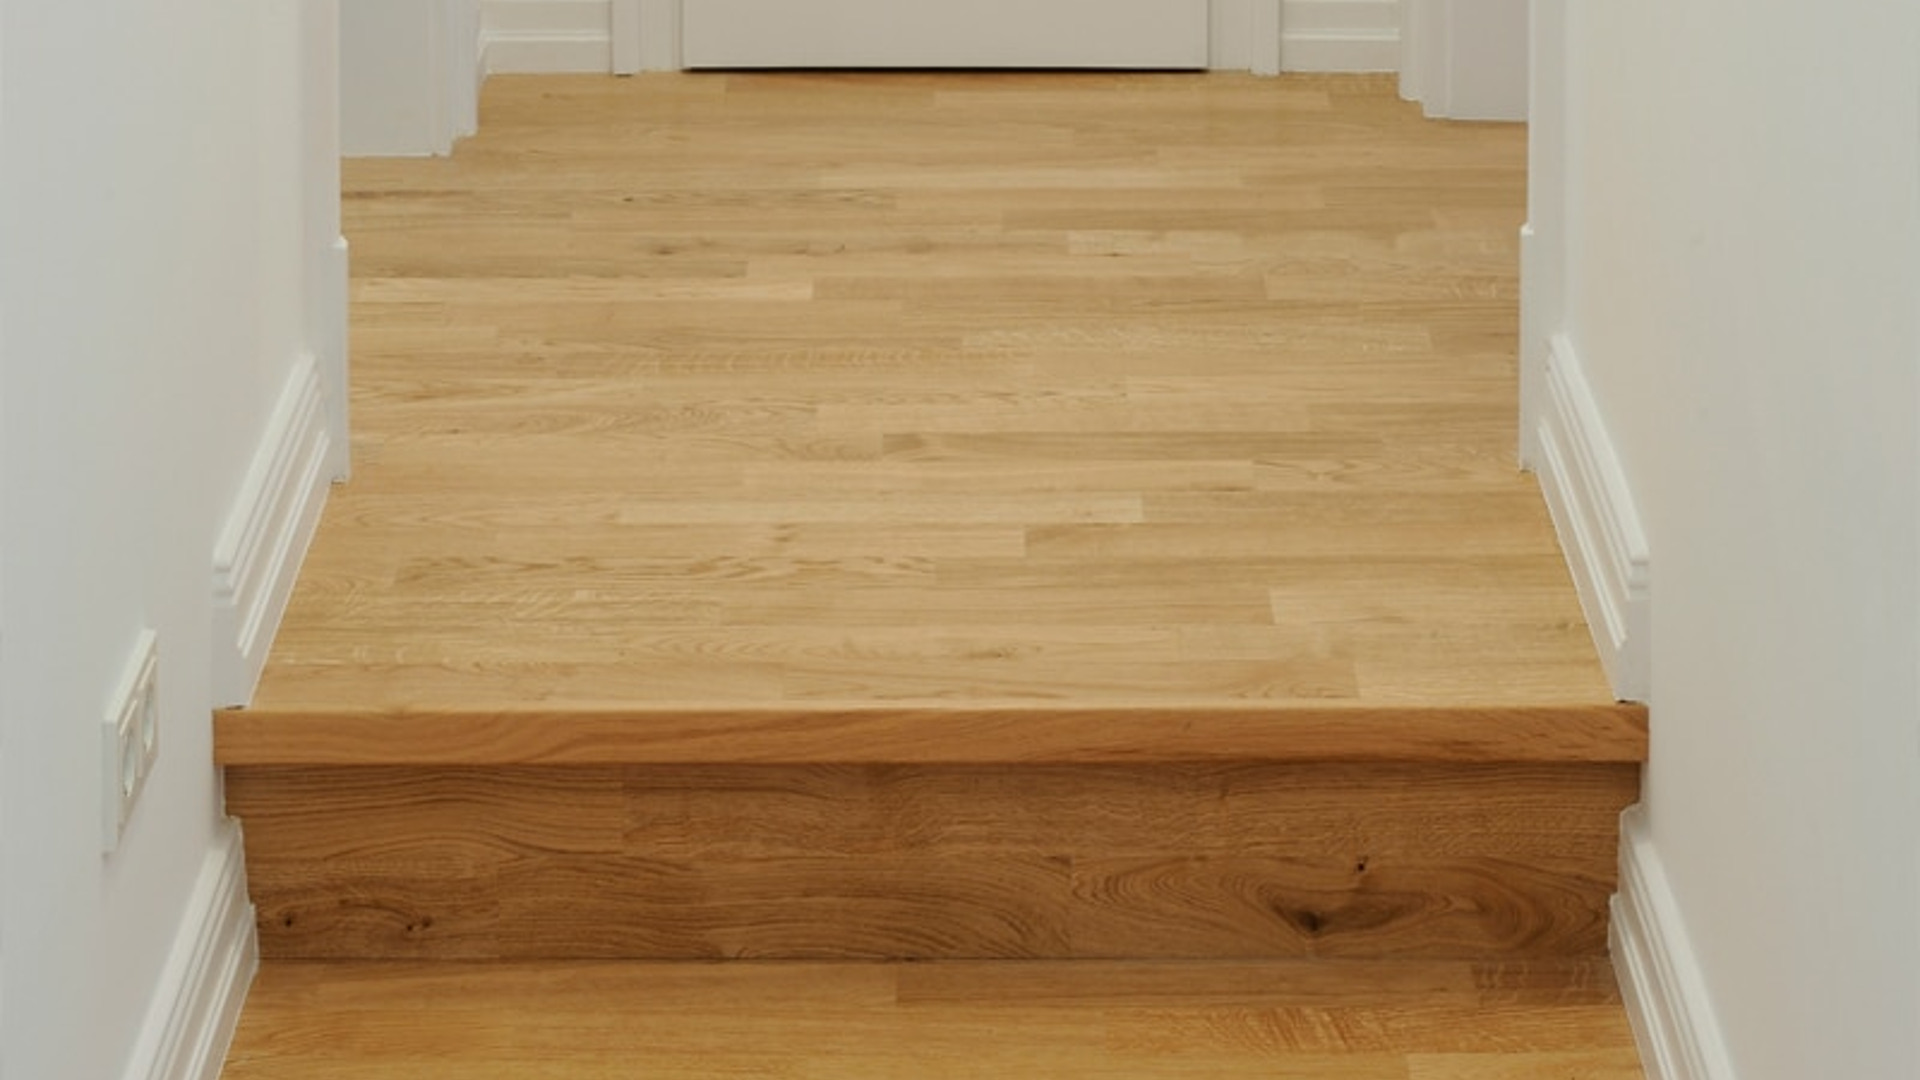 Fußboden Modernisieren ~ Fußbodenmodernisierung in koblenz bhg koblenz